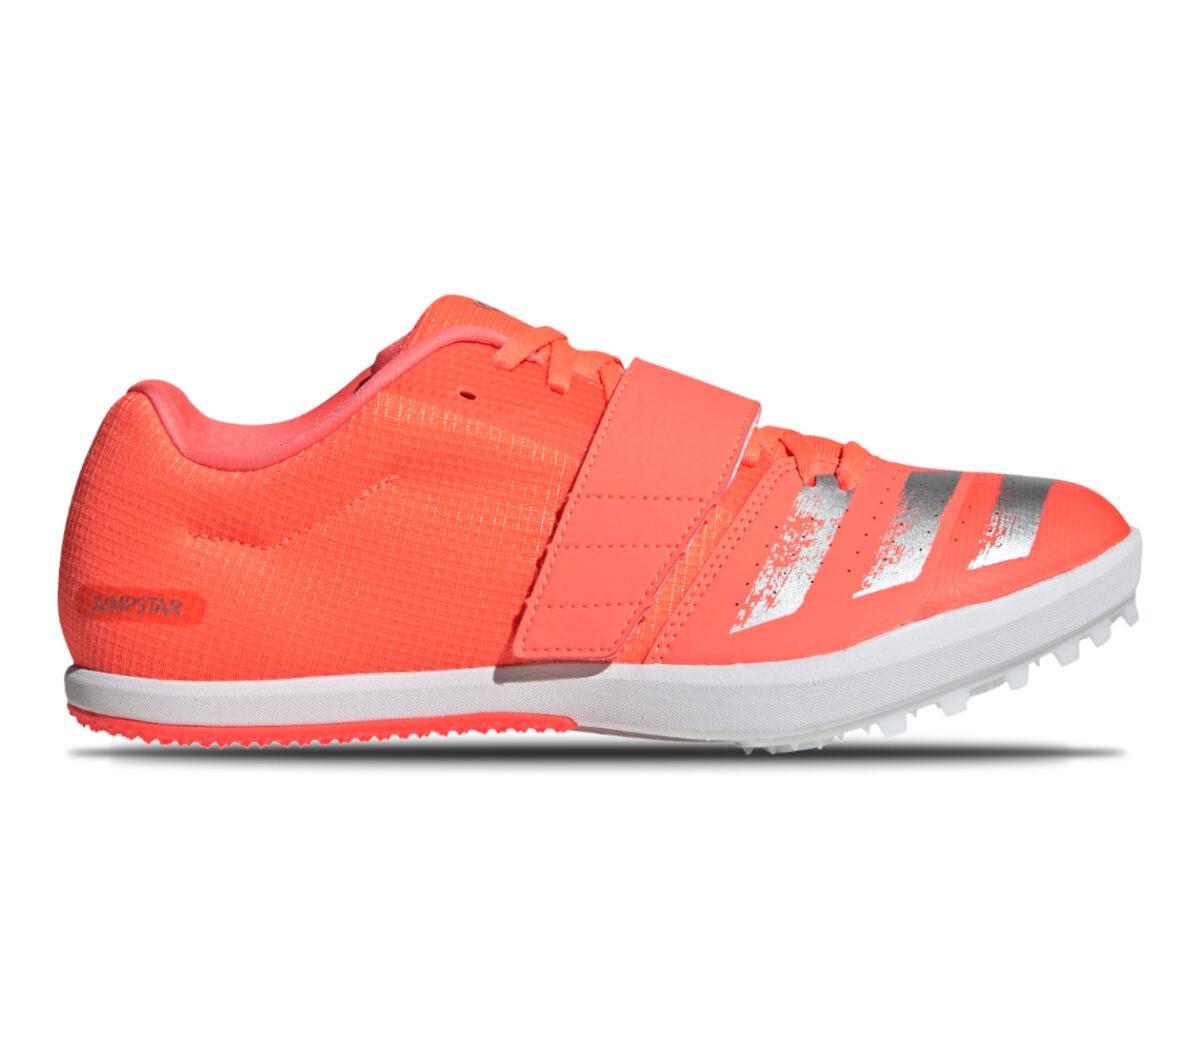 scarpa chiodata per salto adidas jumpstar